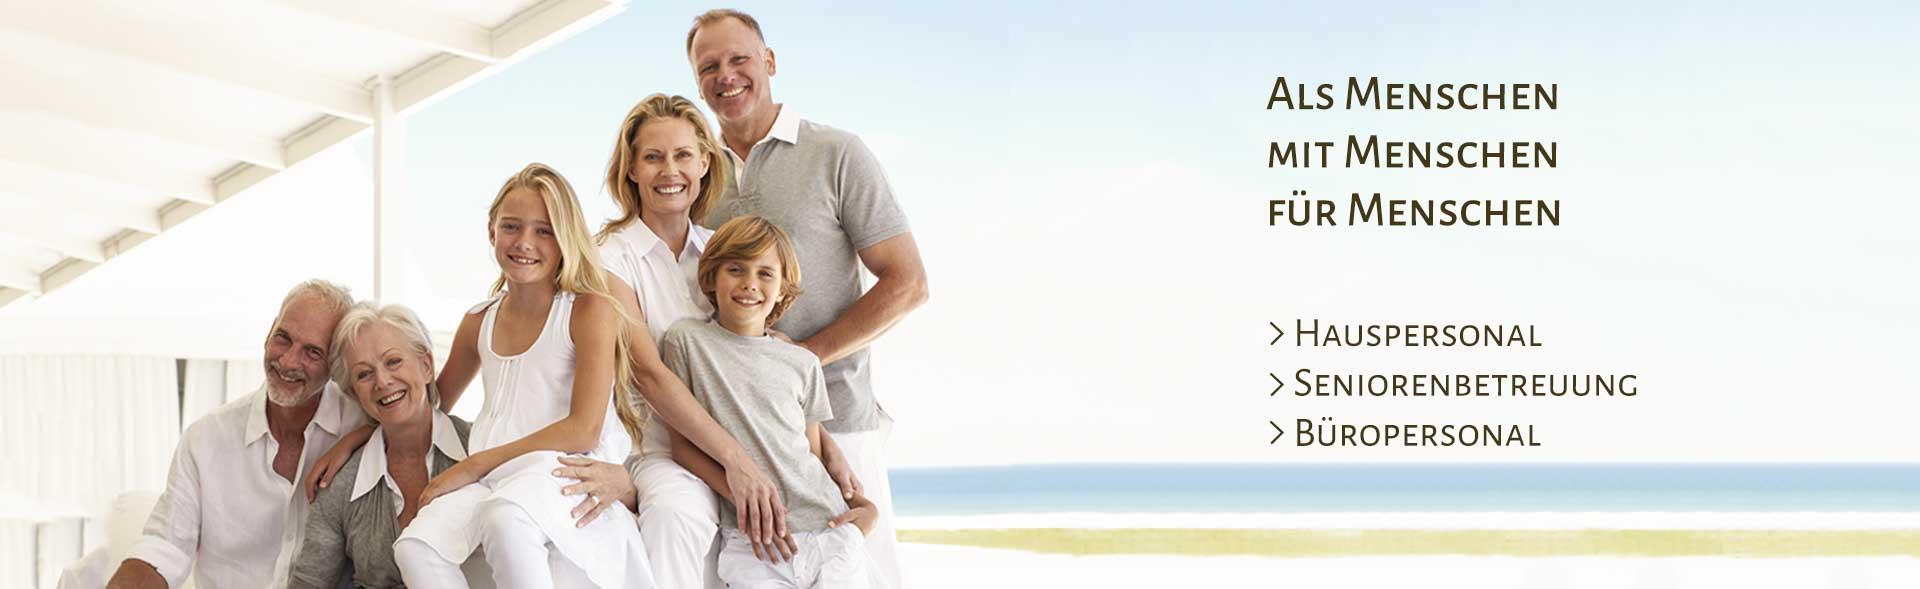 Familie - Drei Generationen